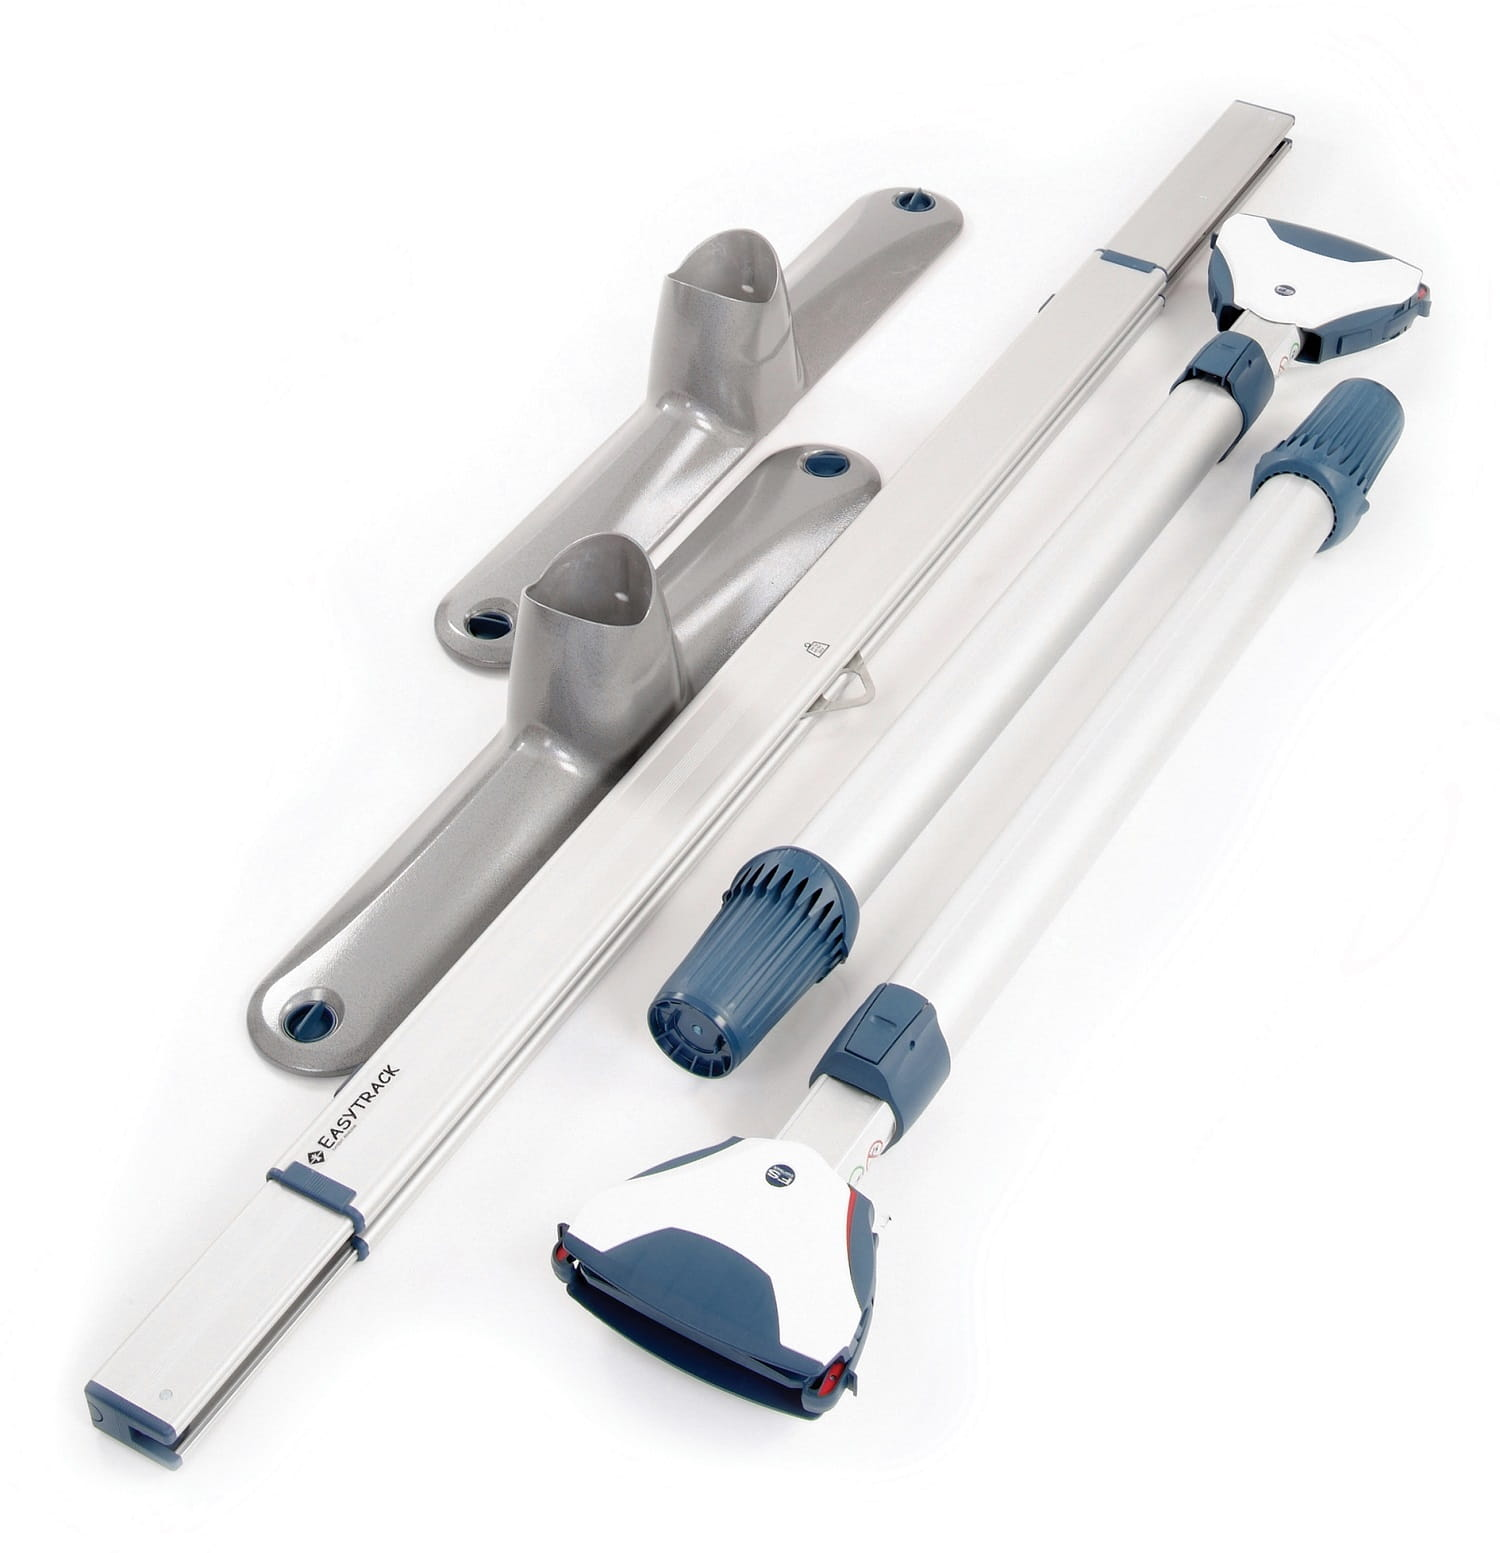 Easytrack-FS-Voyager-Free-Standing-Gantry-Components.jpg